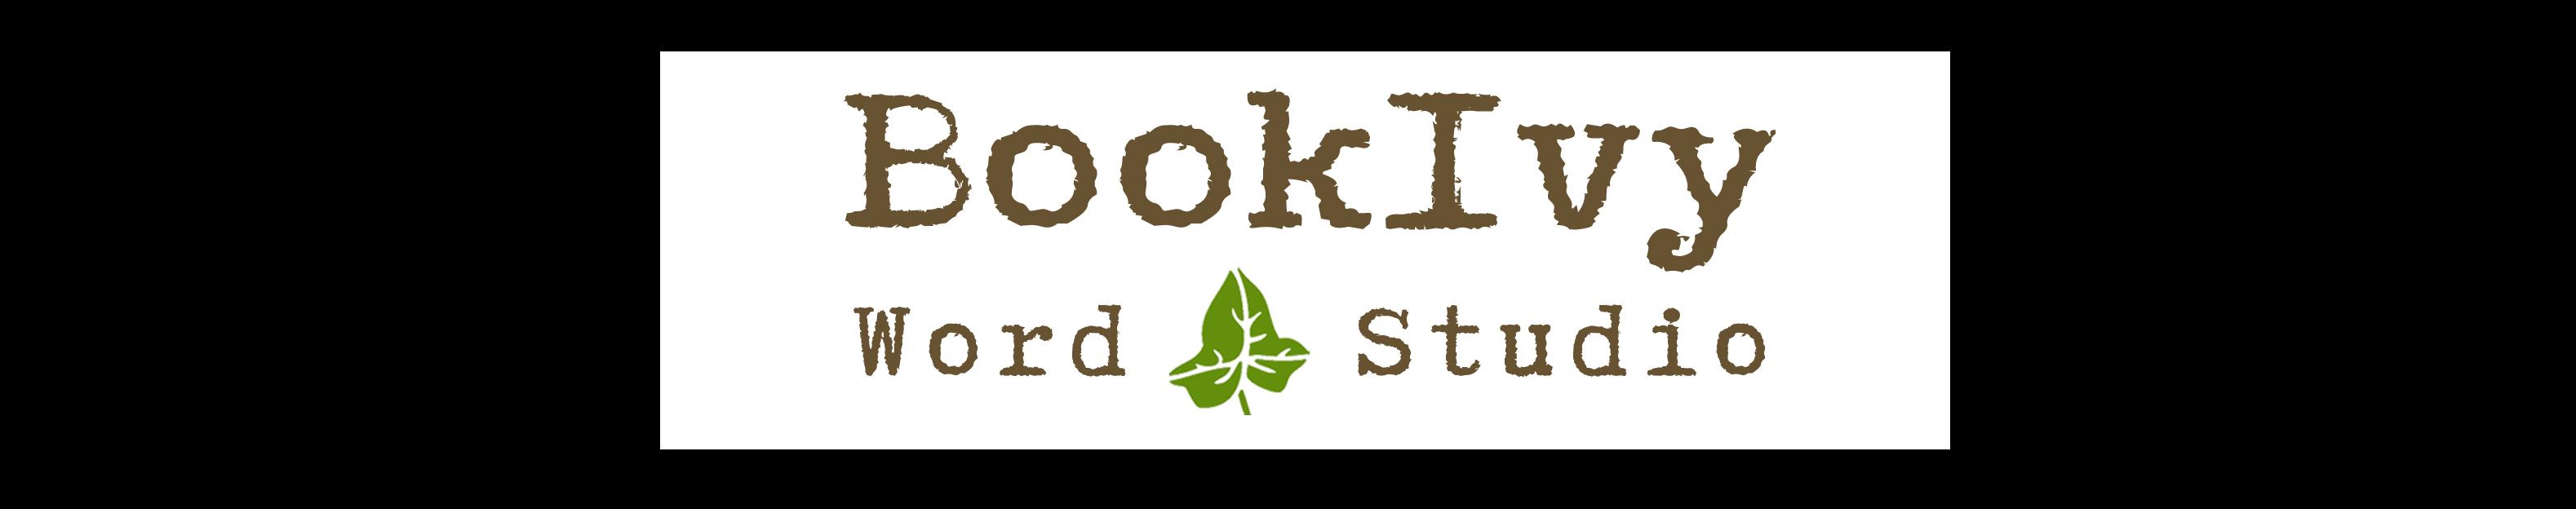 BookIvy Word Studio